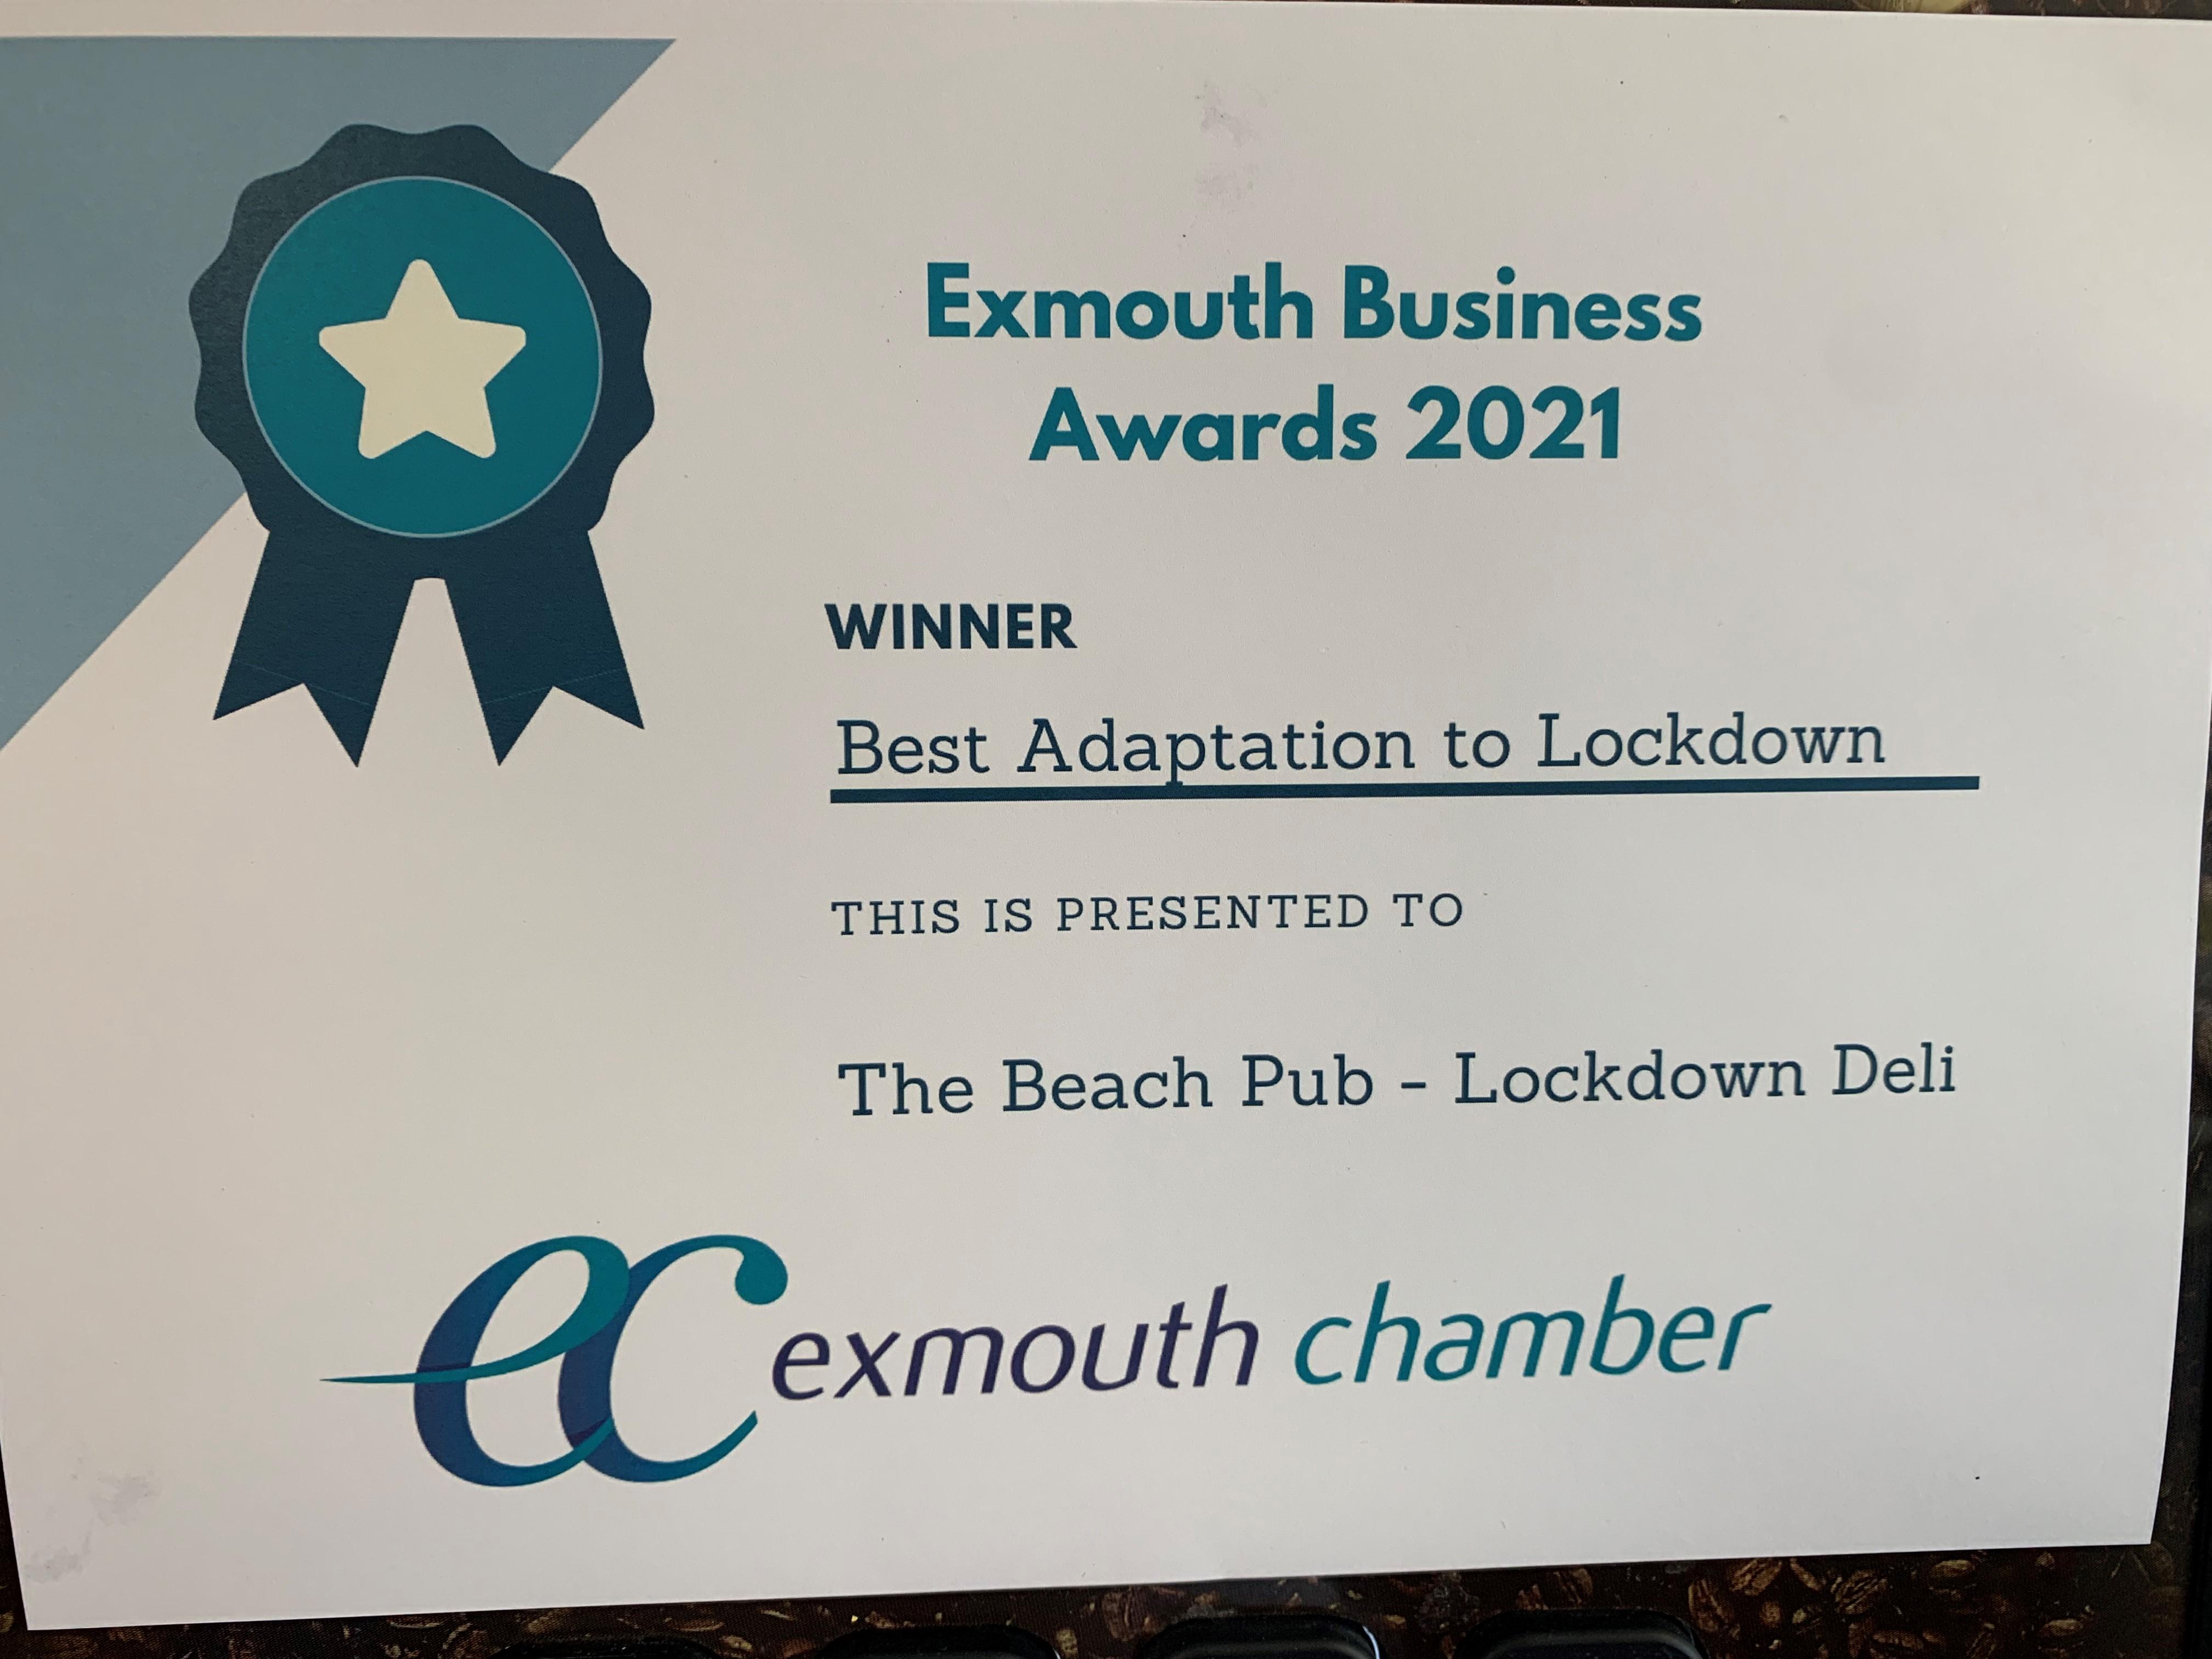 Exmouth Business Awards 2